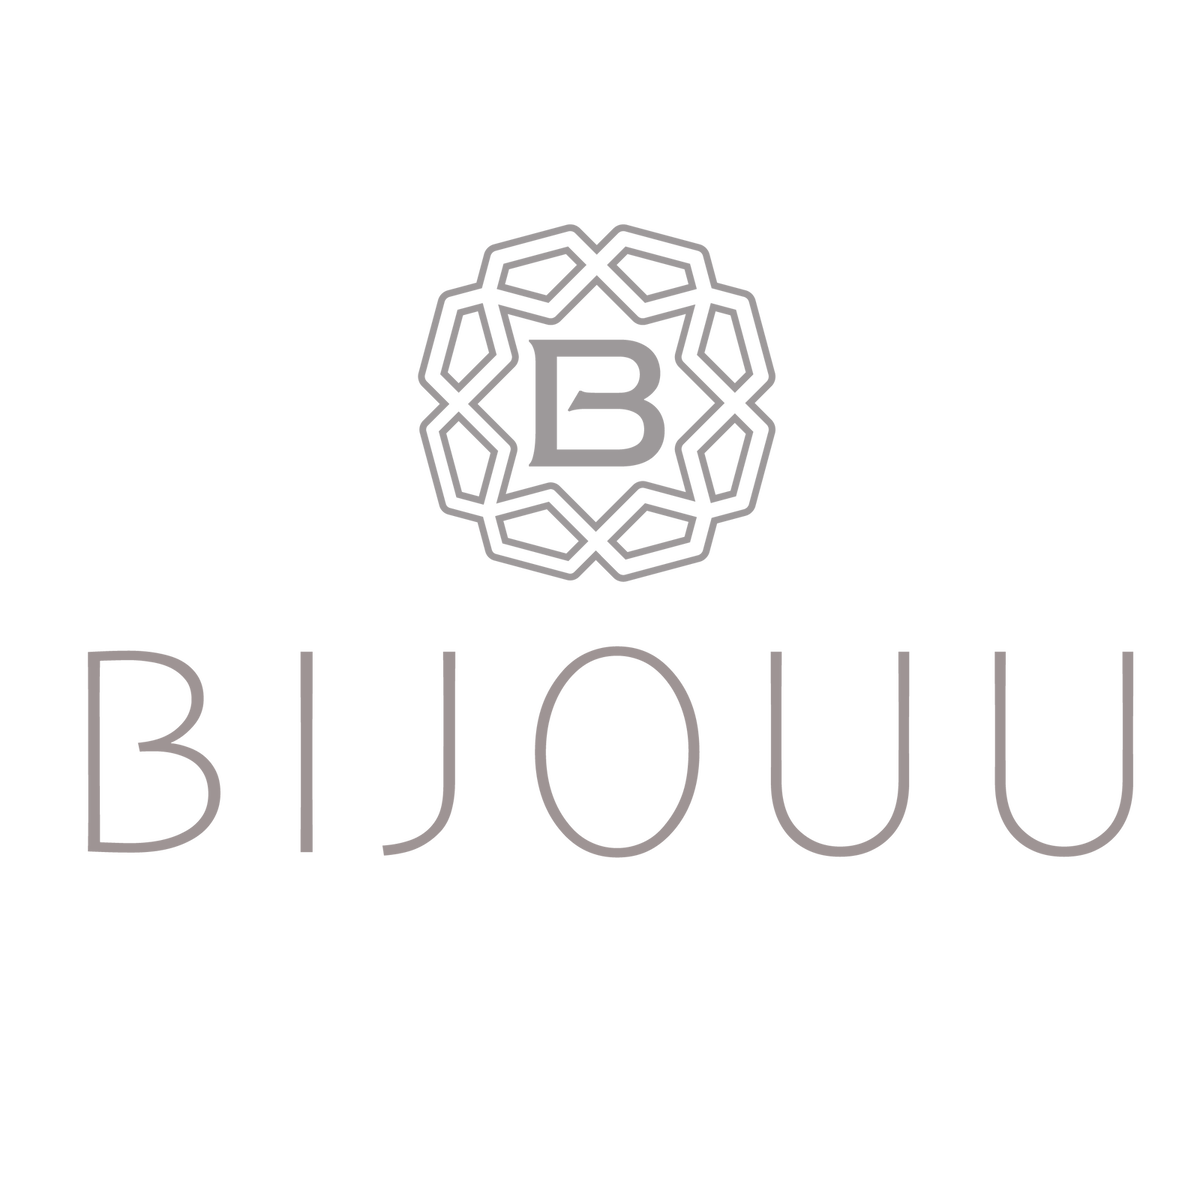 Bijouu